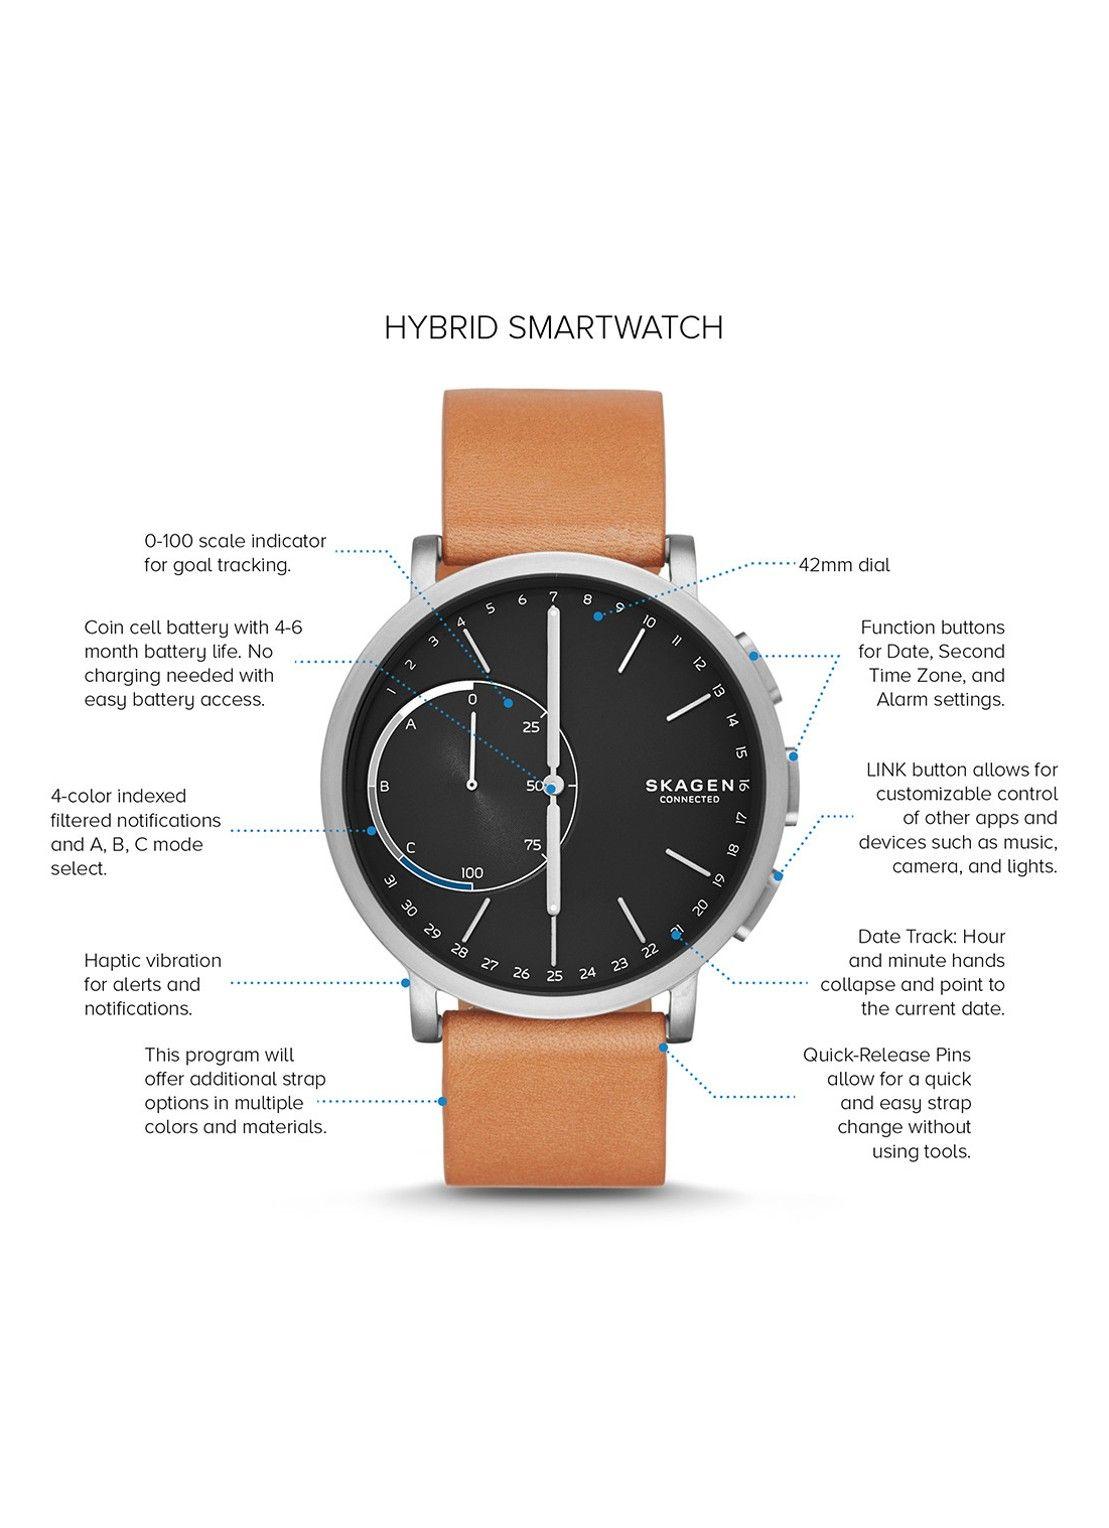 Skagen Hybrid Smartwatch Hagen Skt1104 De Bijenkorf Hybrid